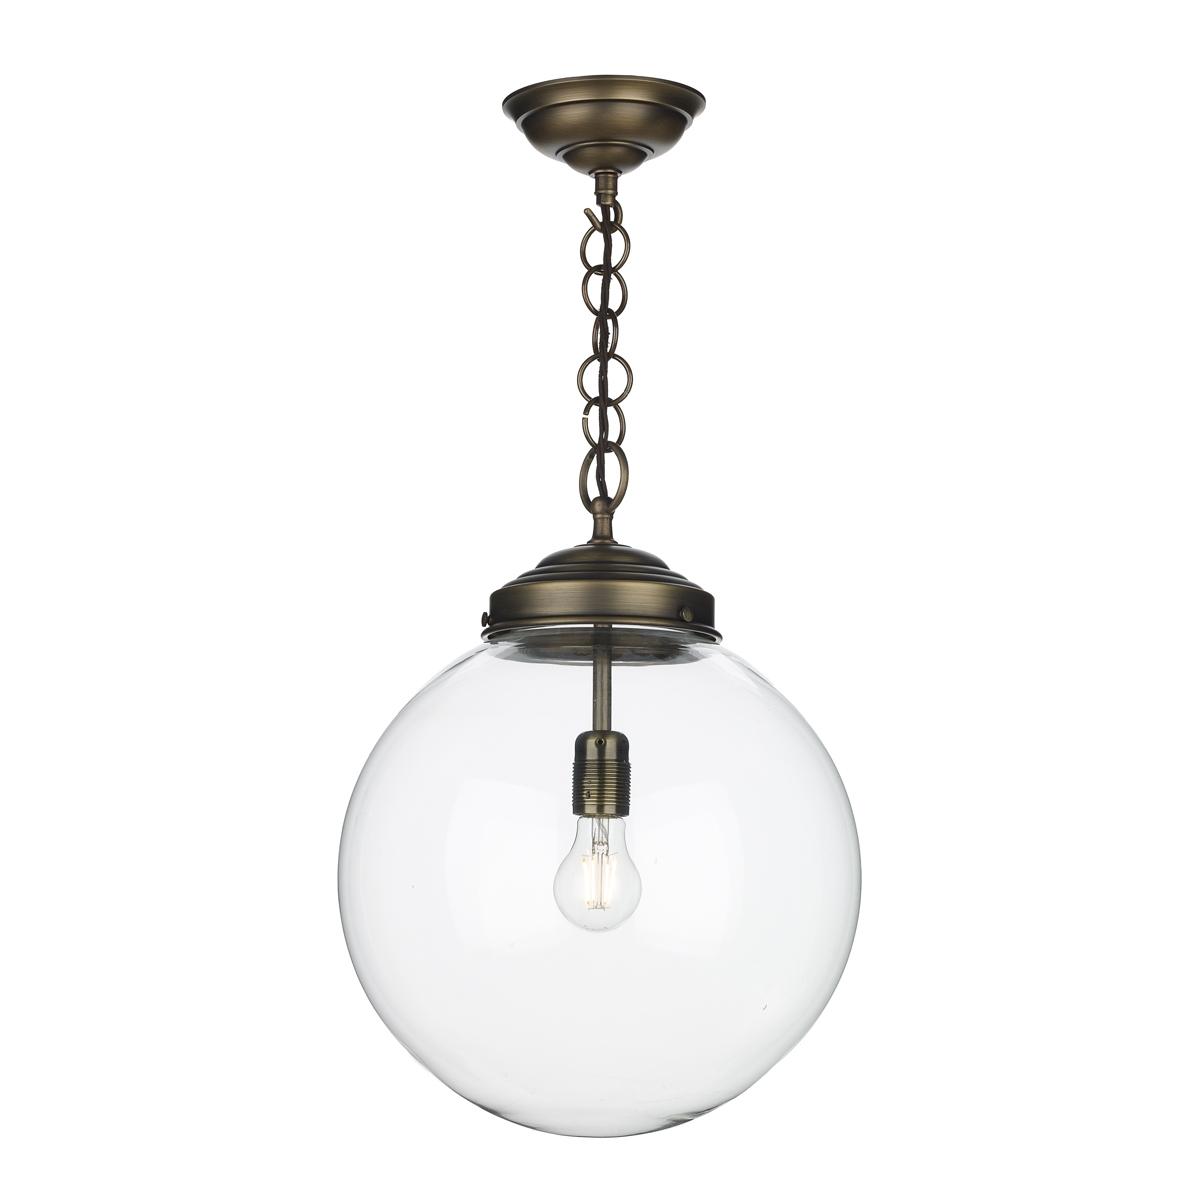 david hunt lighting fairfax antique brass pendant fai0175